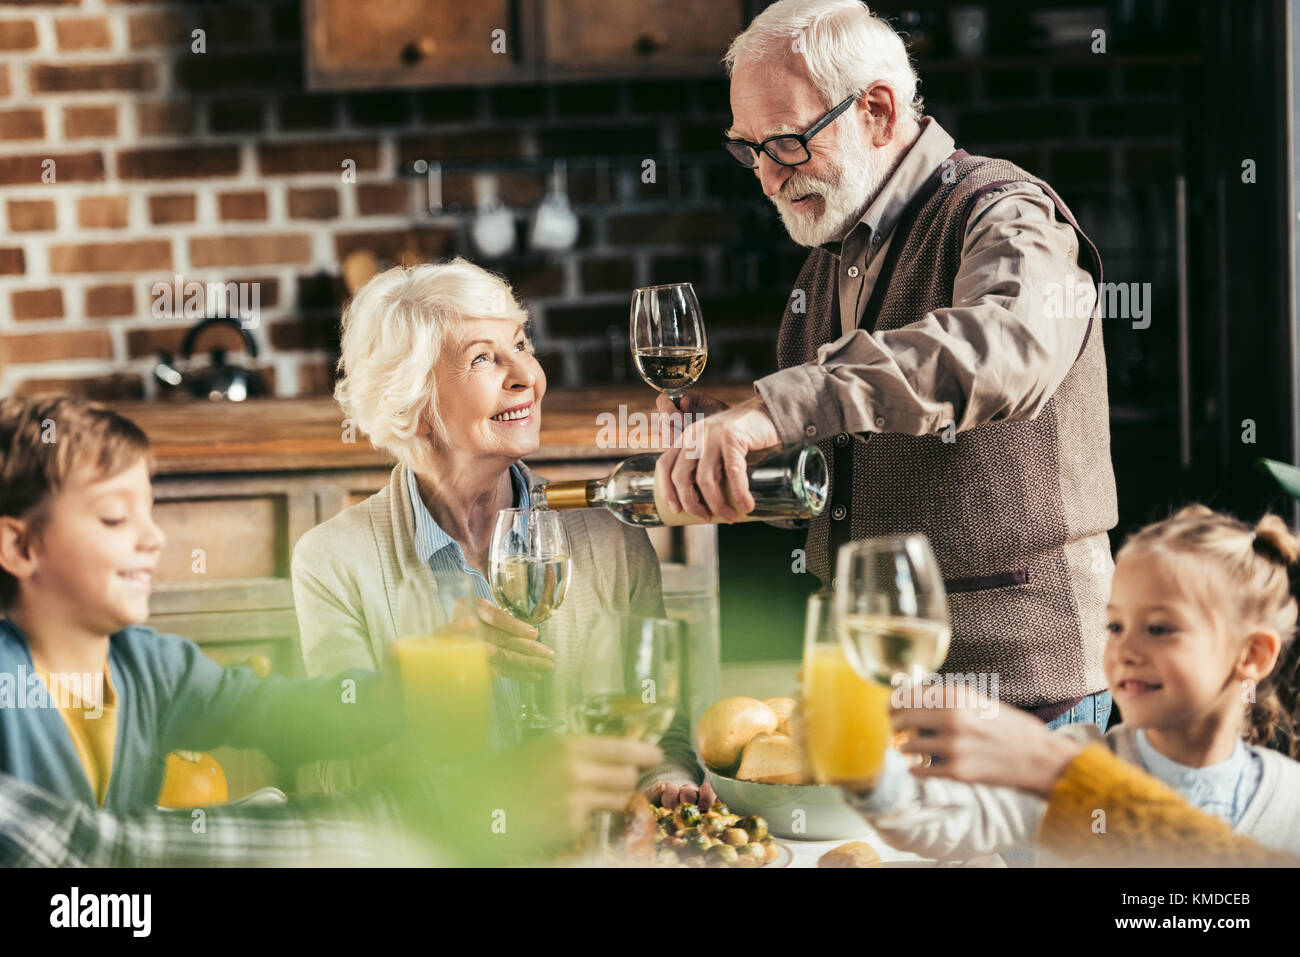 Man pouring wine pour femme Photo Stock